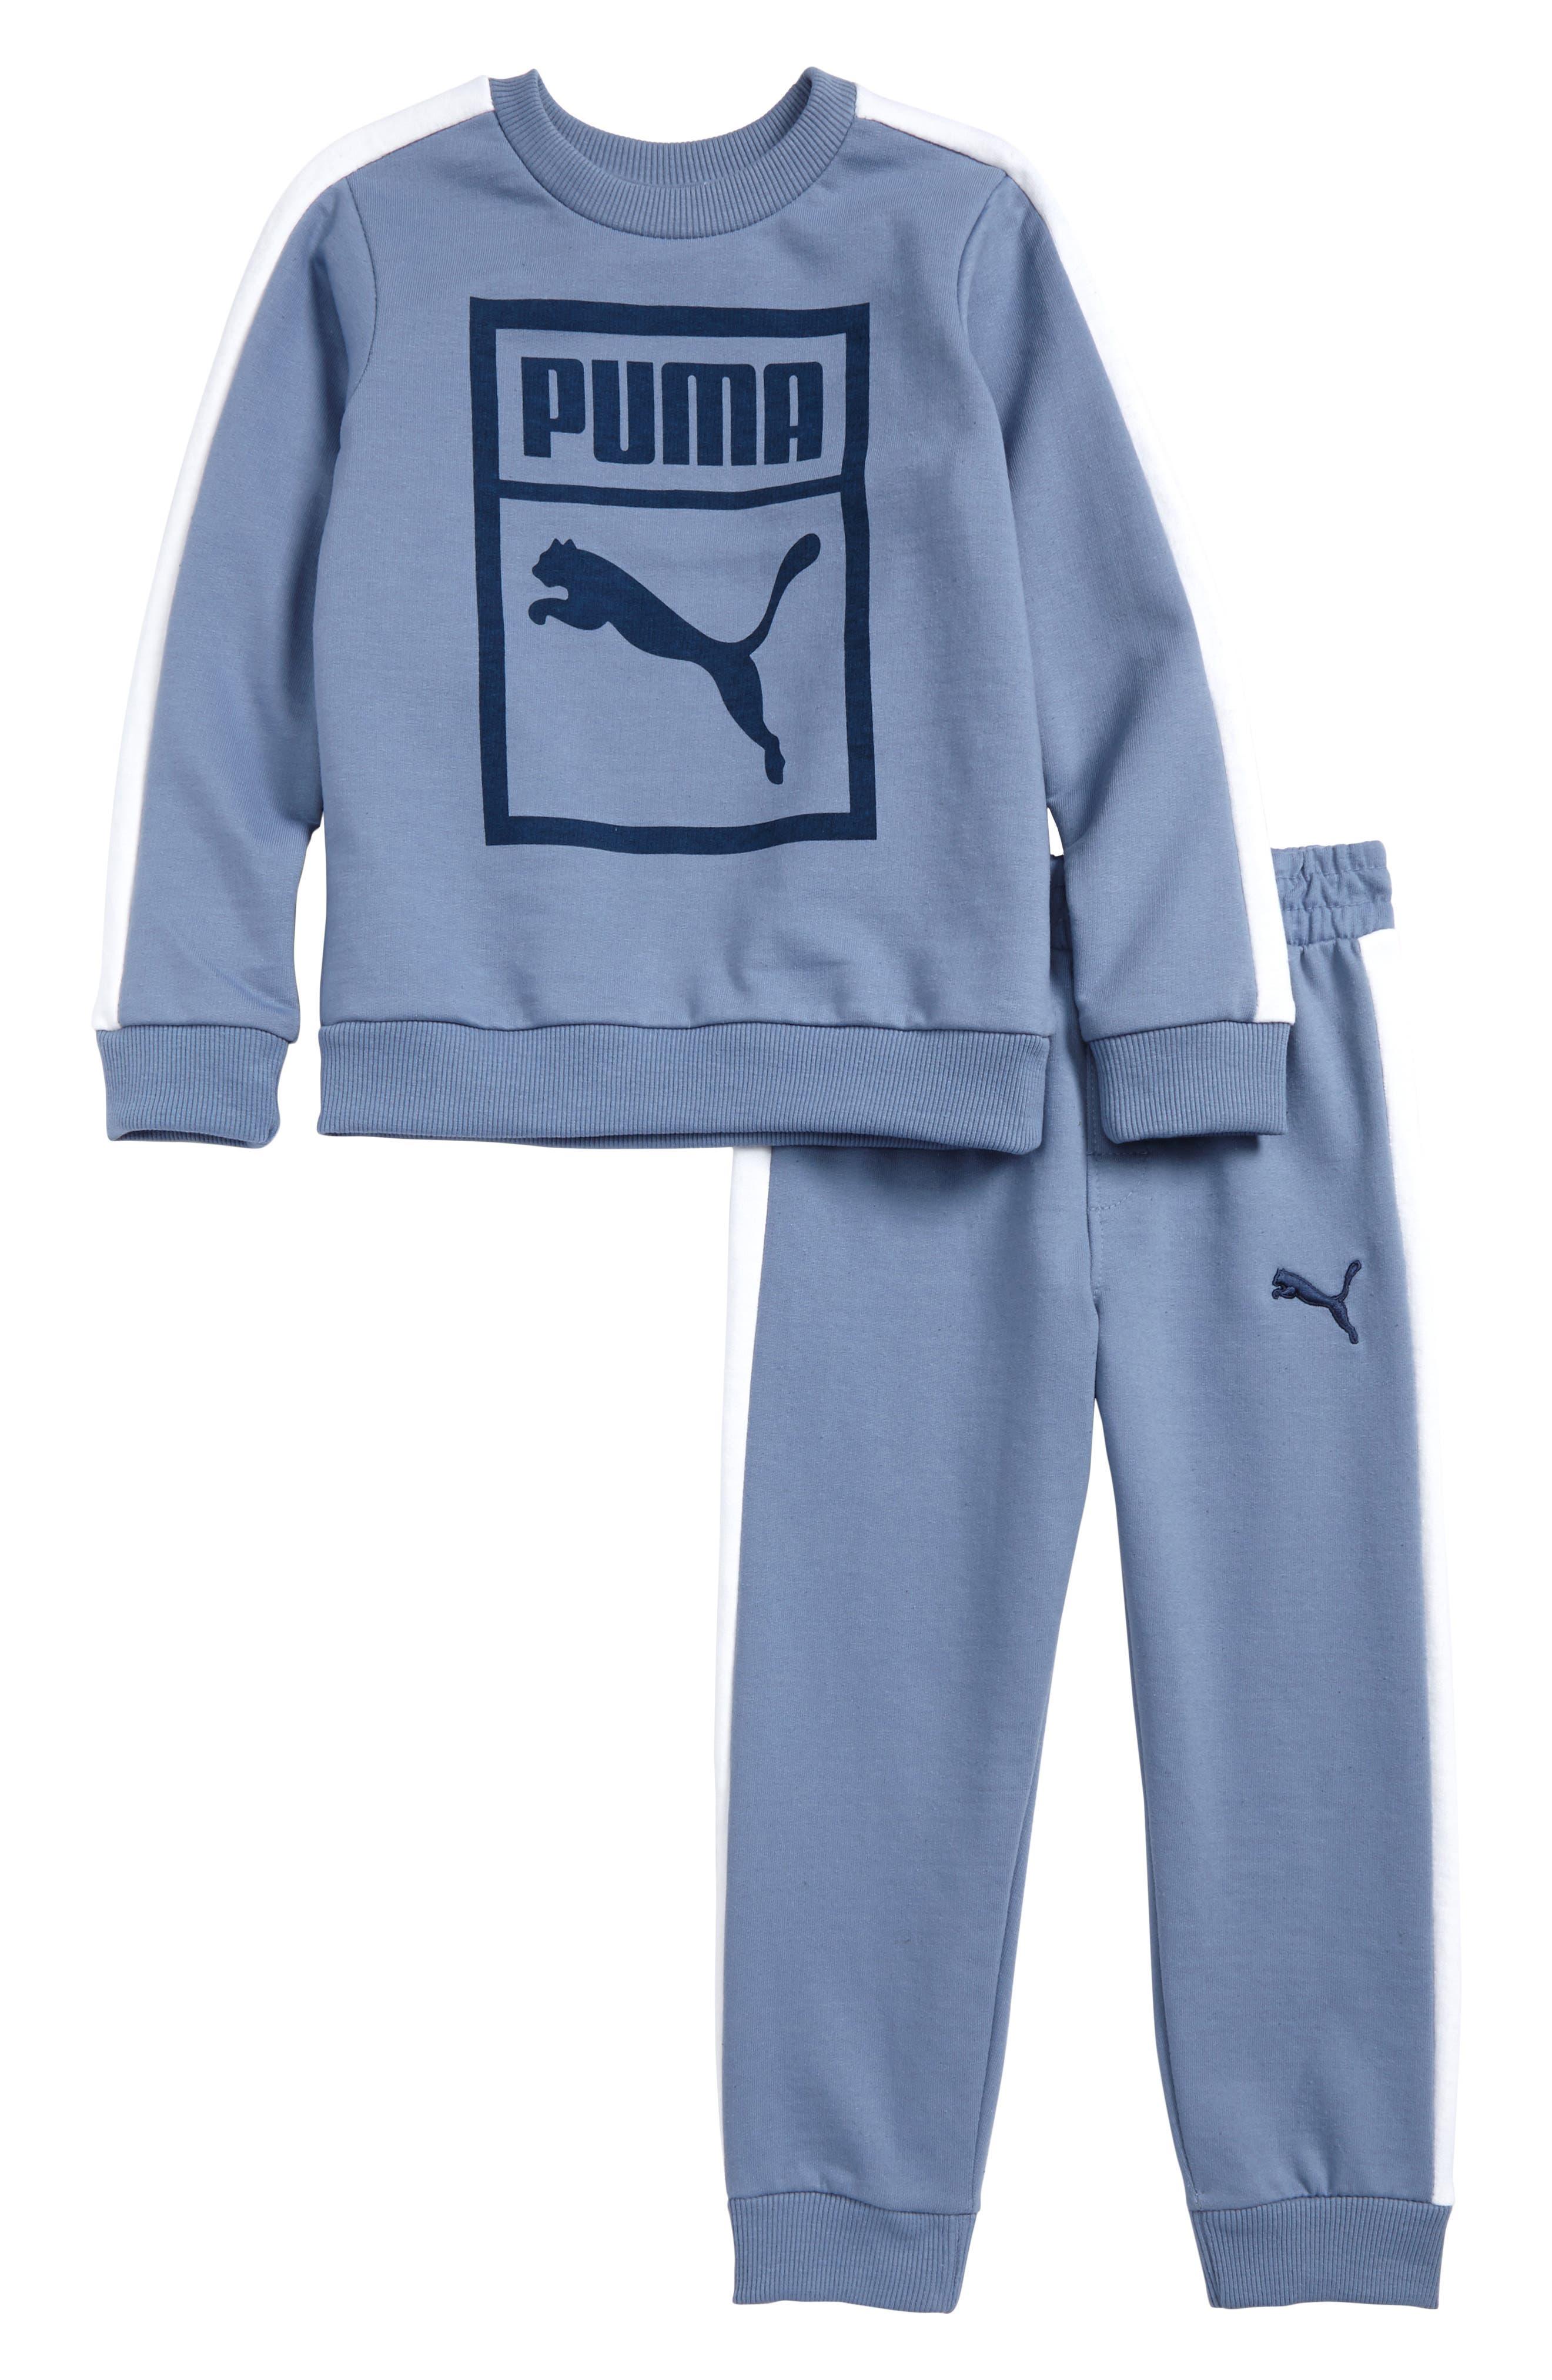 Main Image - PUMA Heritage Sweatshirt & Sweatpants Set (Toddler Boys & Little Boys)